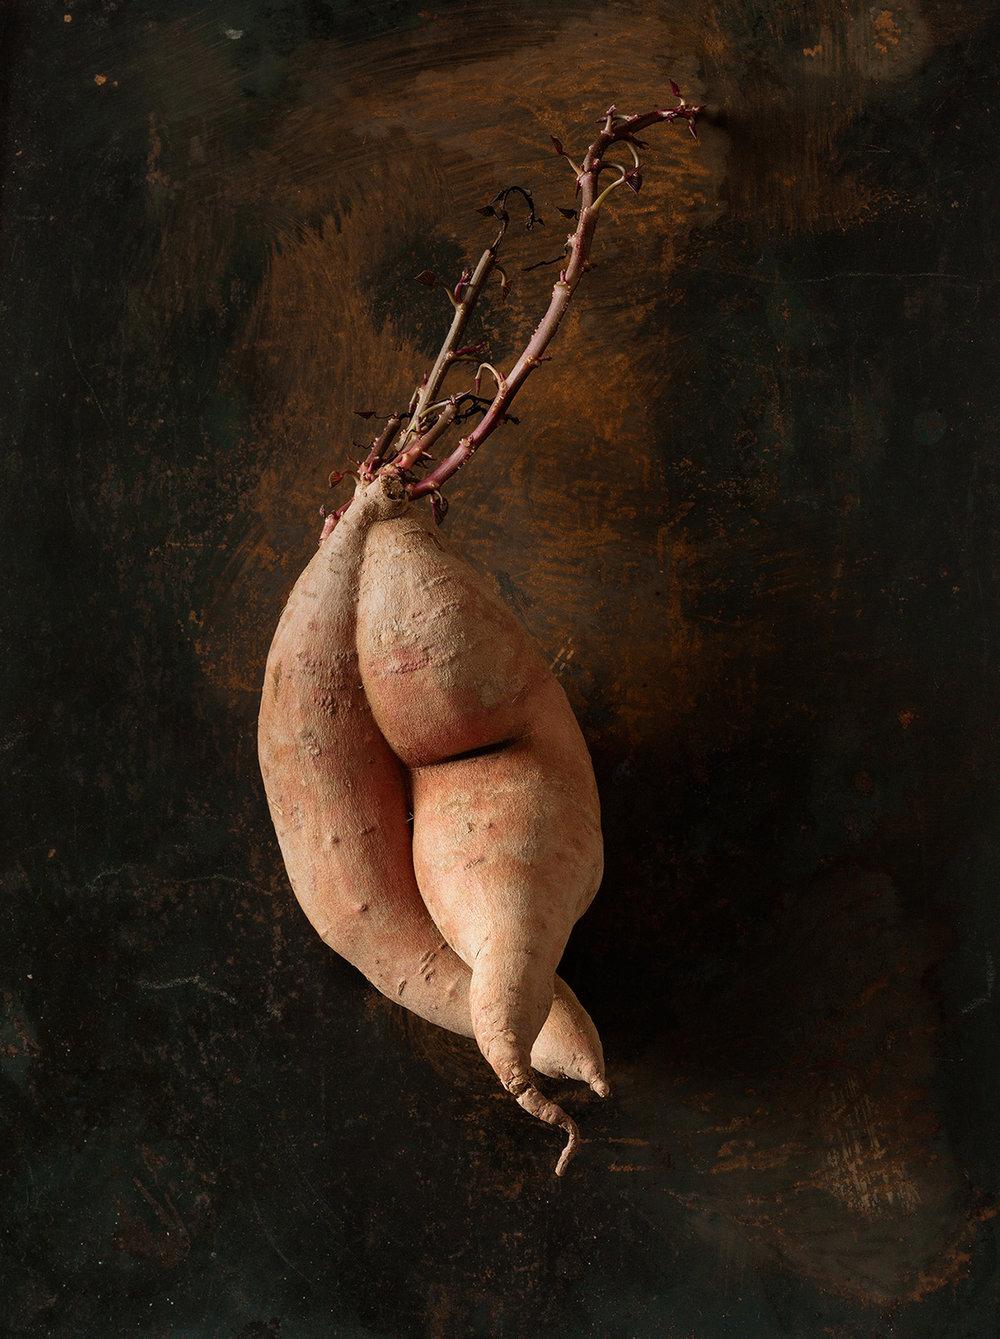 52_Beth_Galton_Amour_de_Pomme_de_Terre_Garnet_Sweet_Potato_15days-b_4.jpg